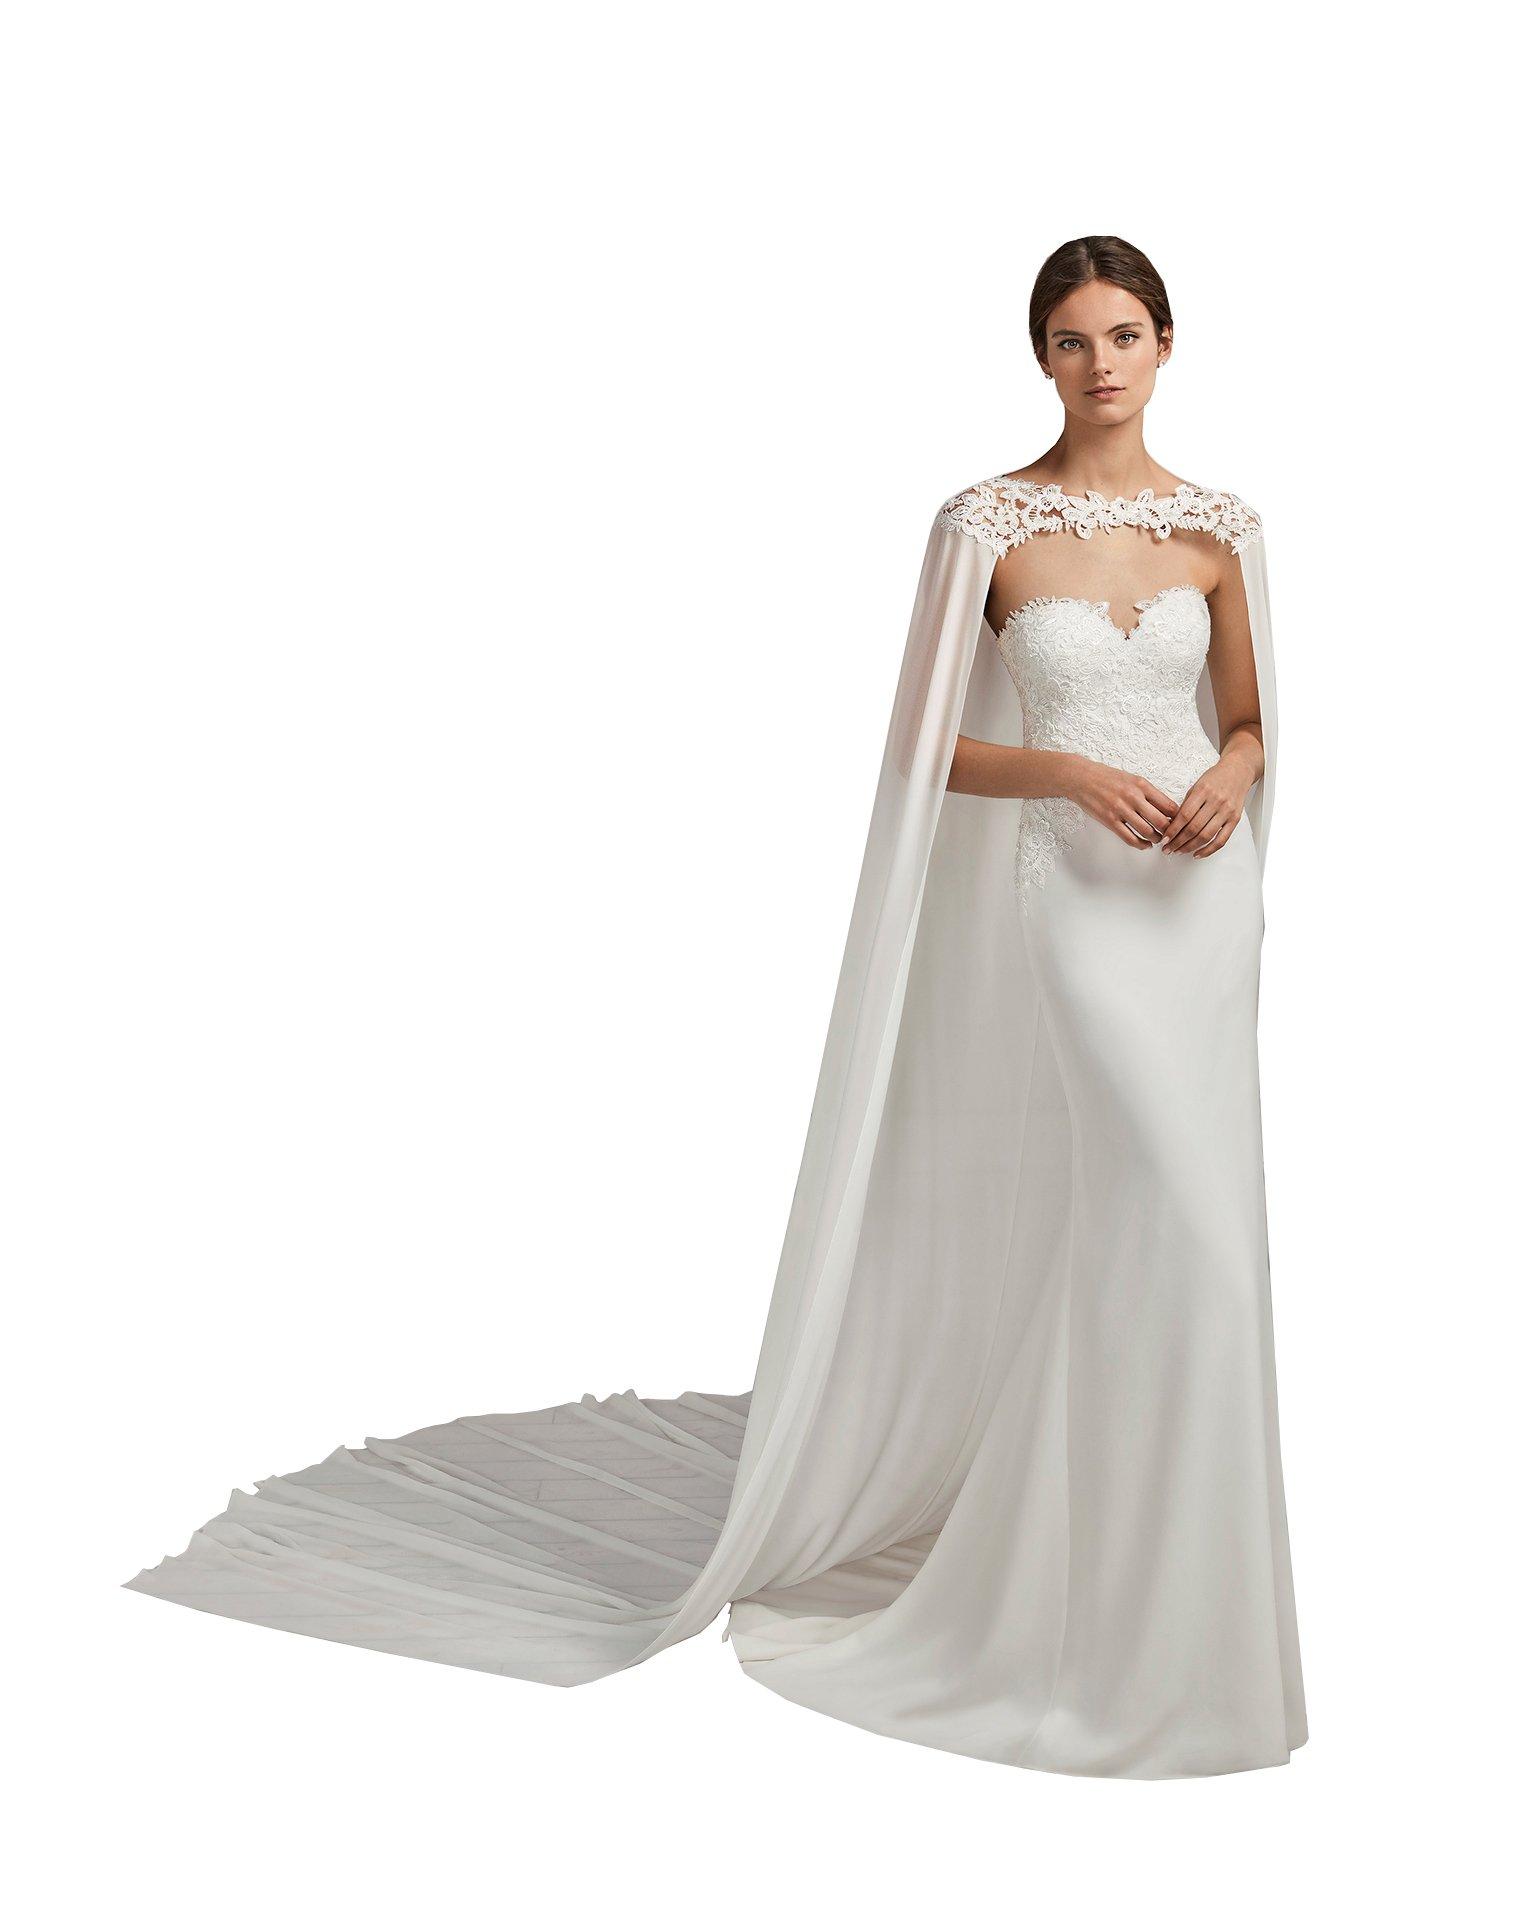 kelaixiang Charming Appliques Cathedral Length 2M Wedding Cloak Bridal Cape (2m, lvory)